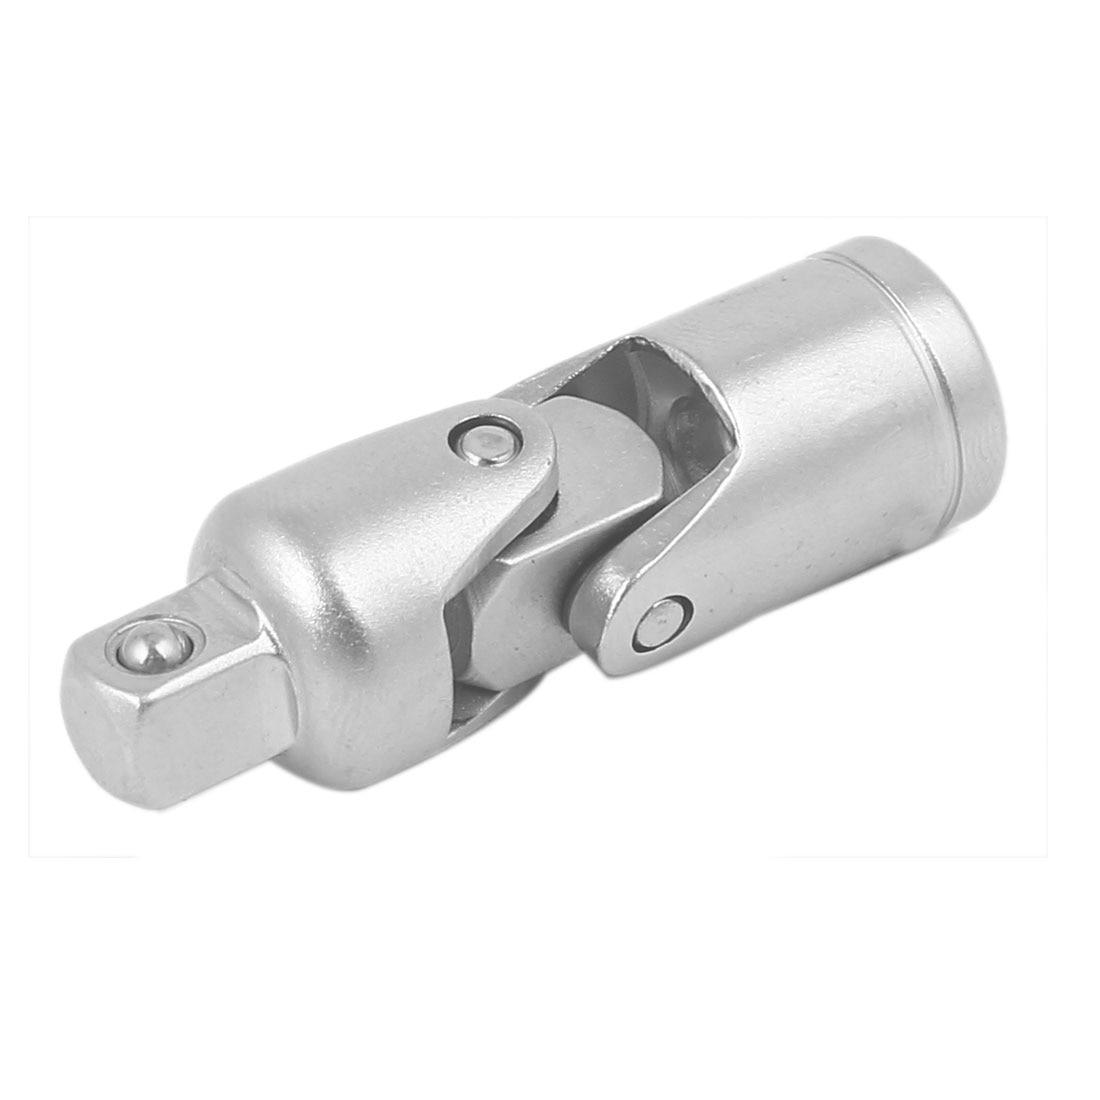 1//4 Inch Drive Universal Joint Chrome-vanadium Steel Silver Tone